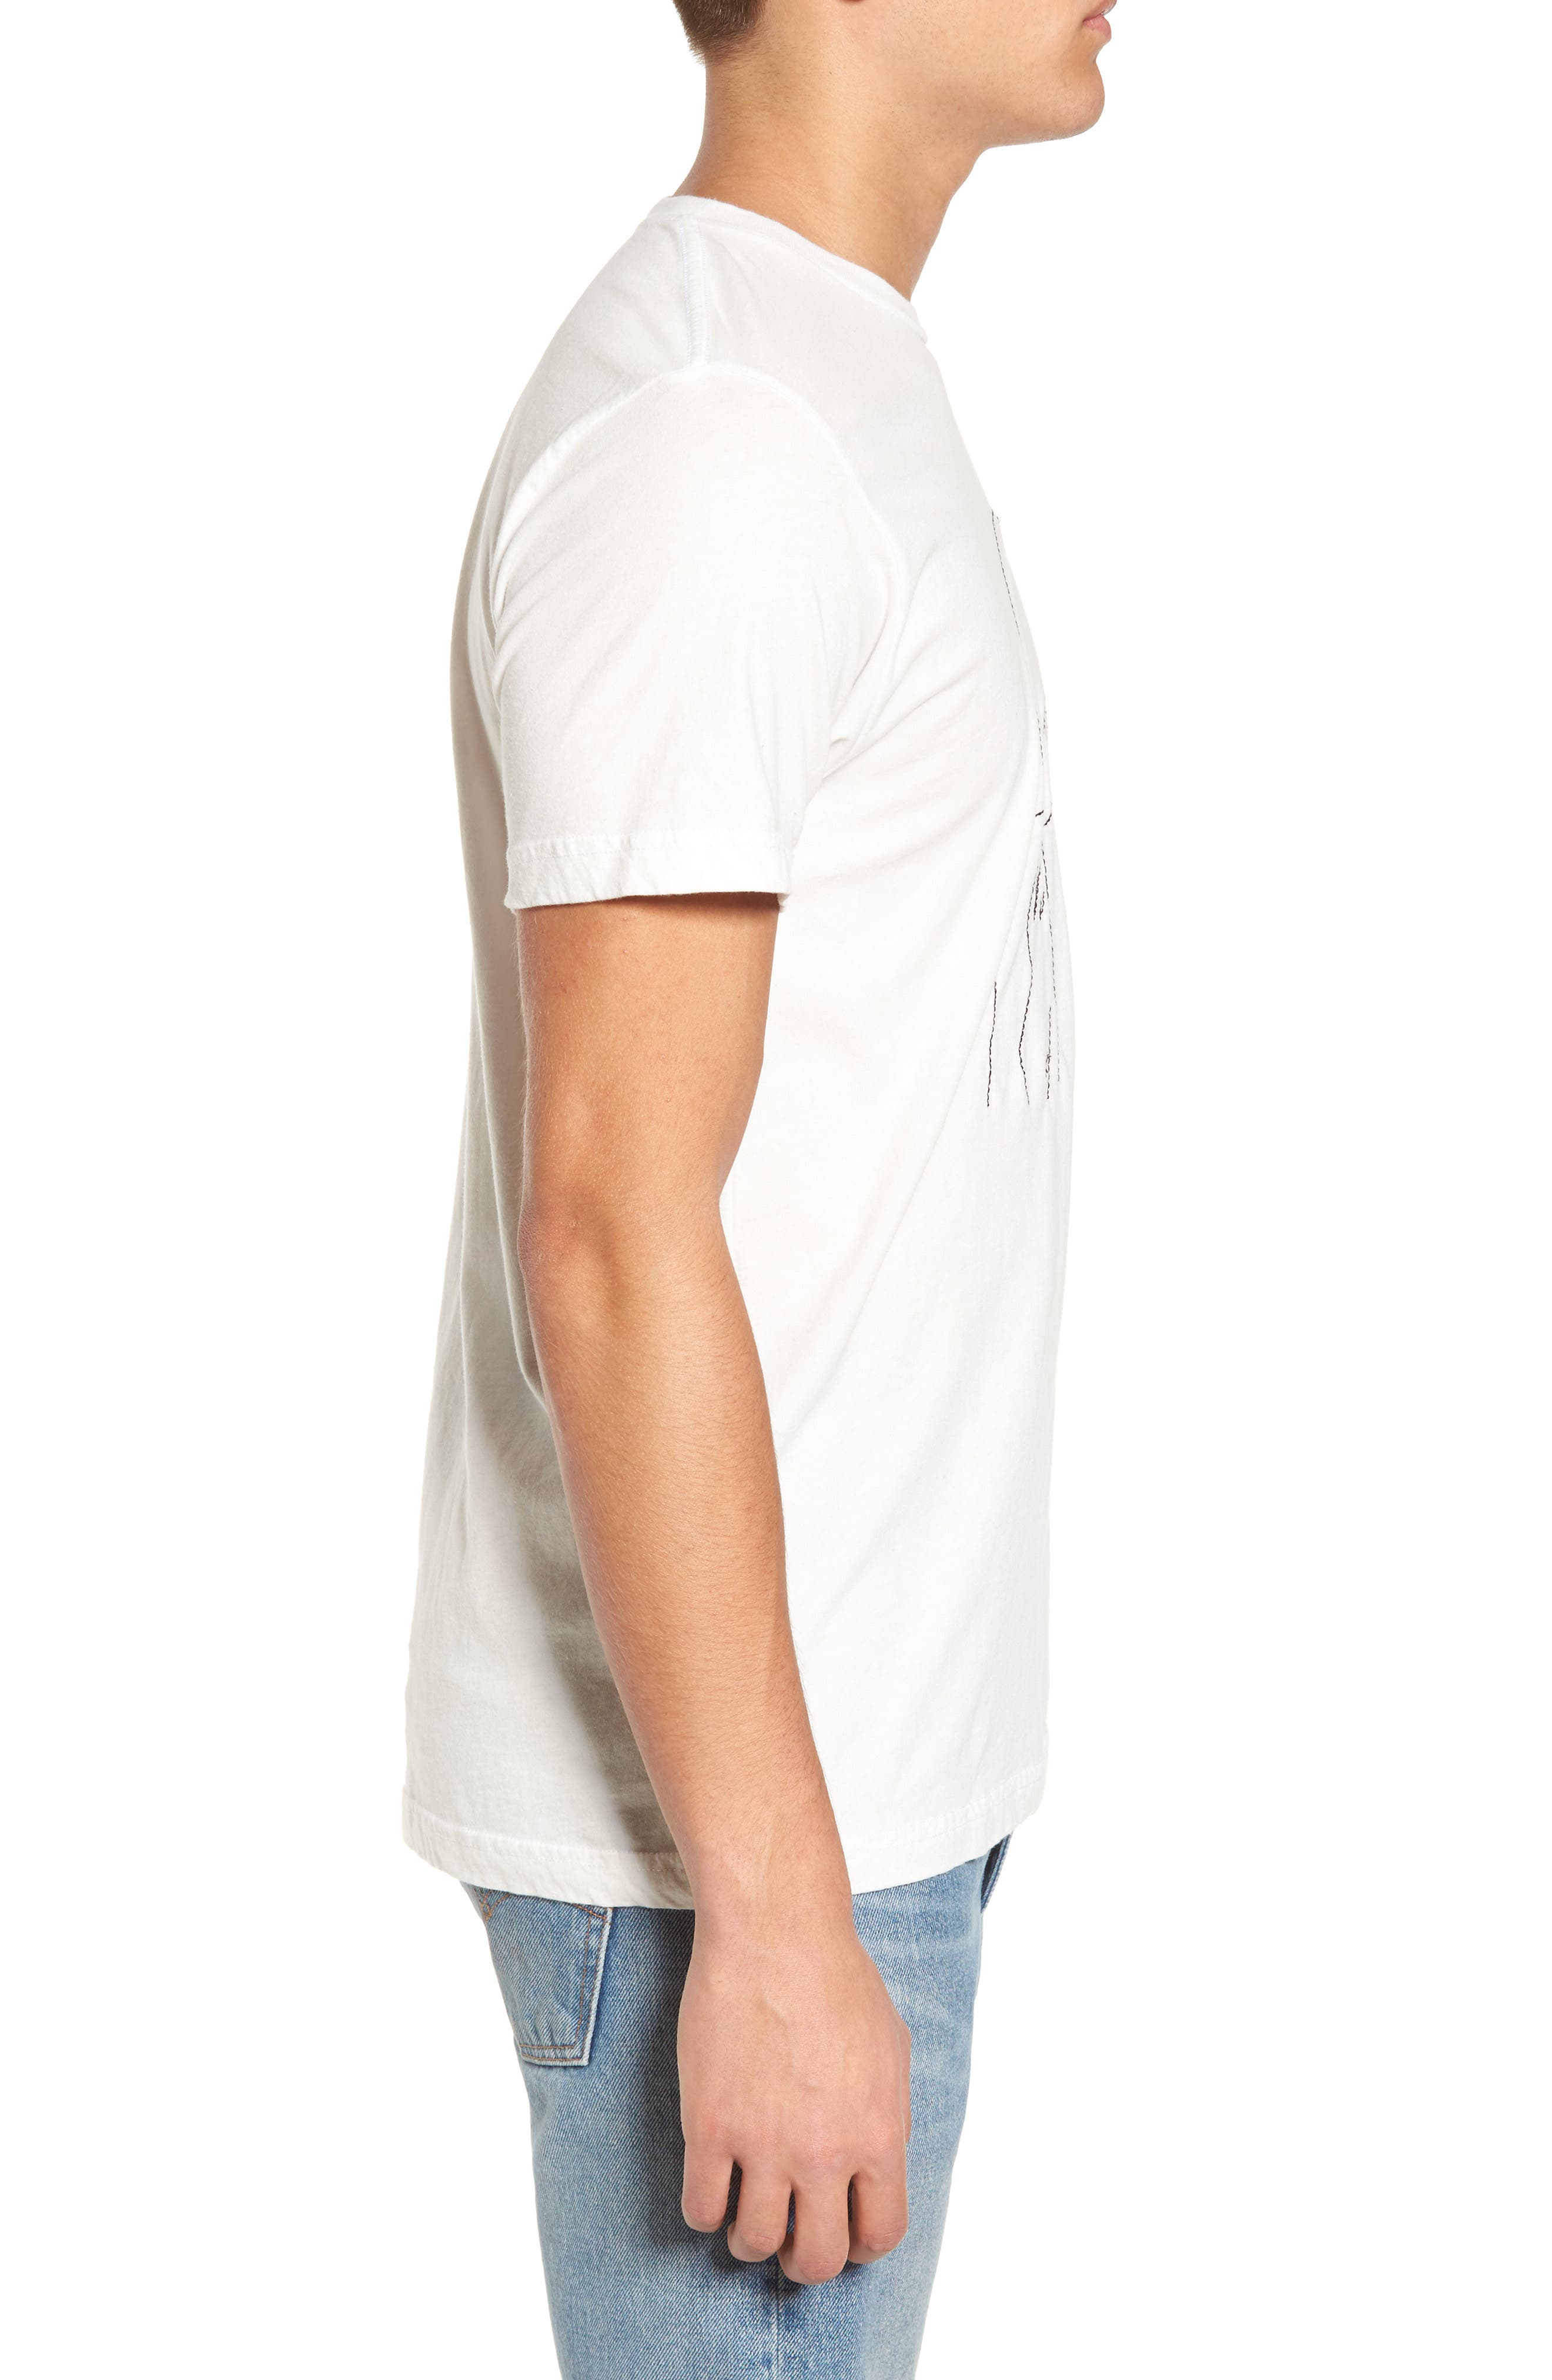 Kate Embroidered T-Shirt,                             Alternate thumbnail 3, color,                             White